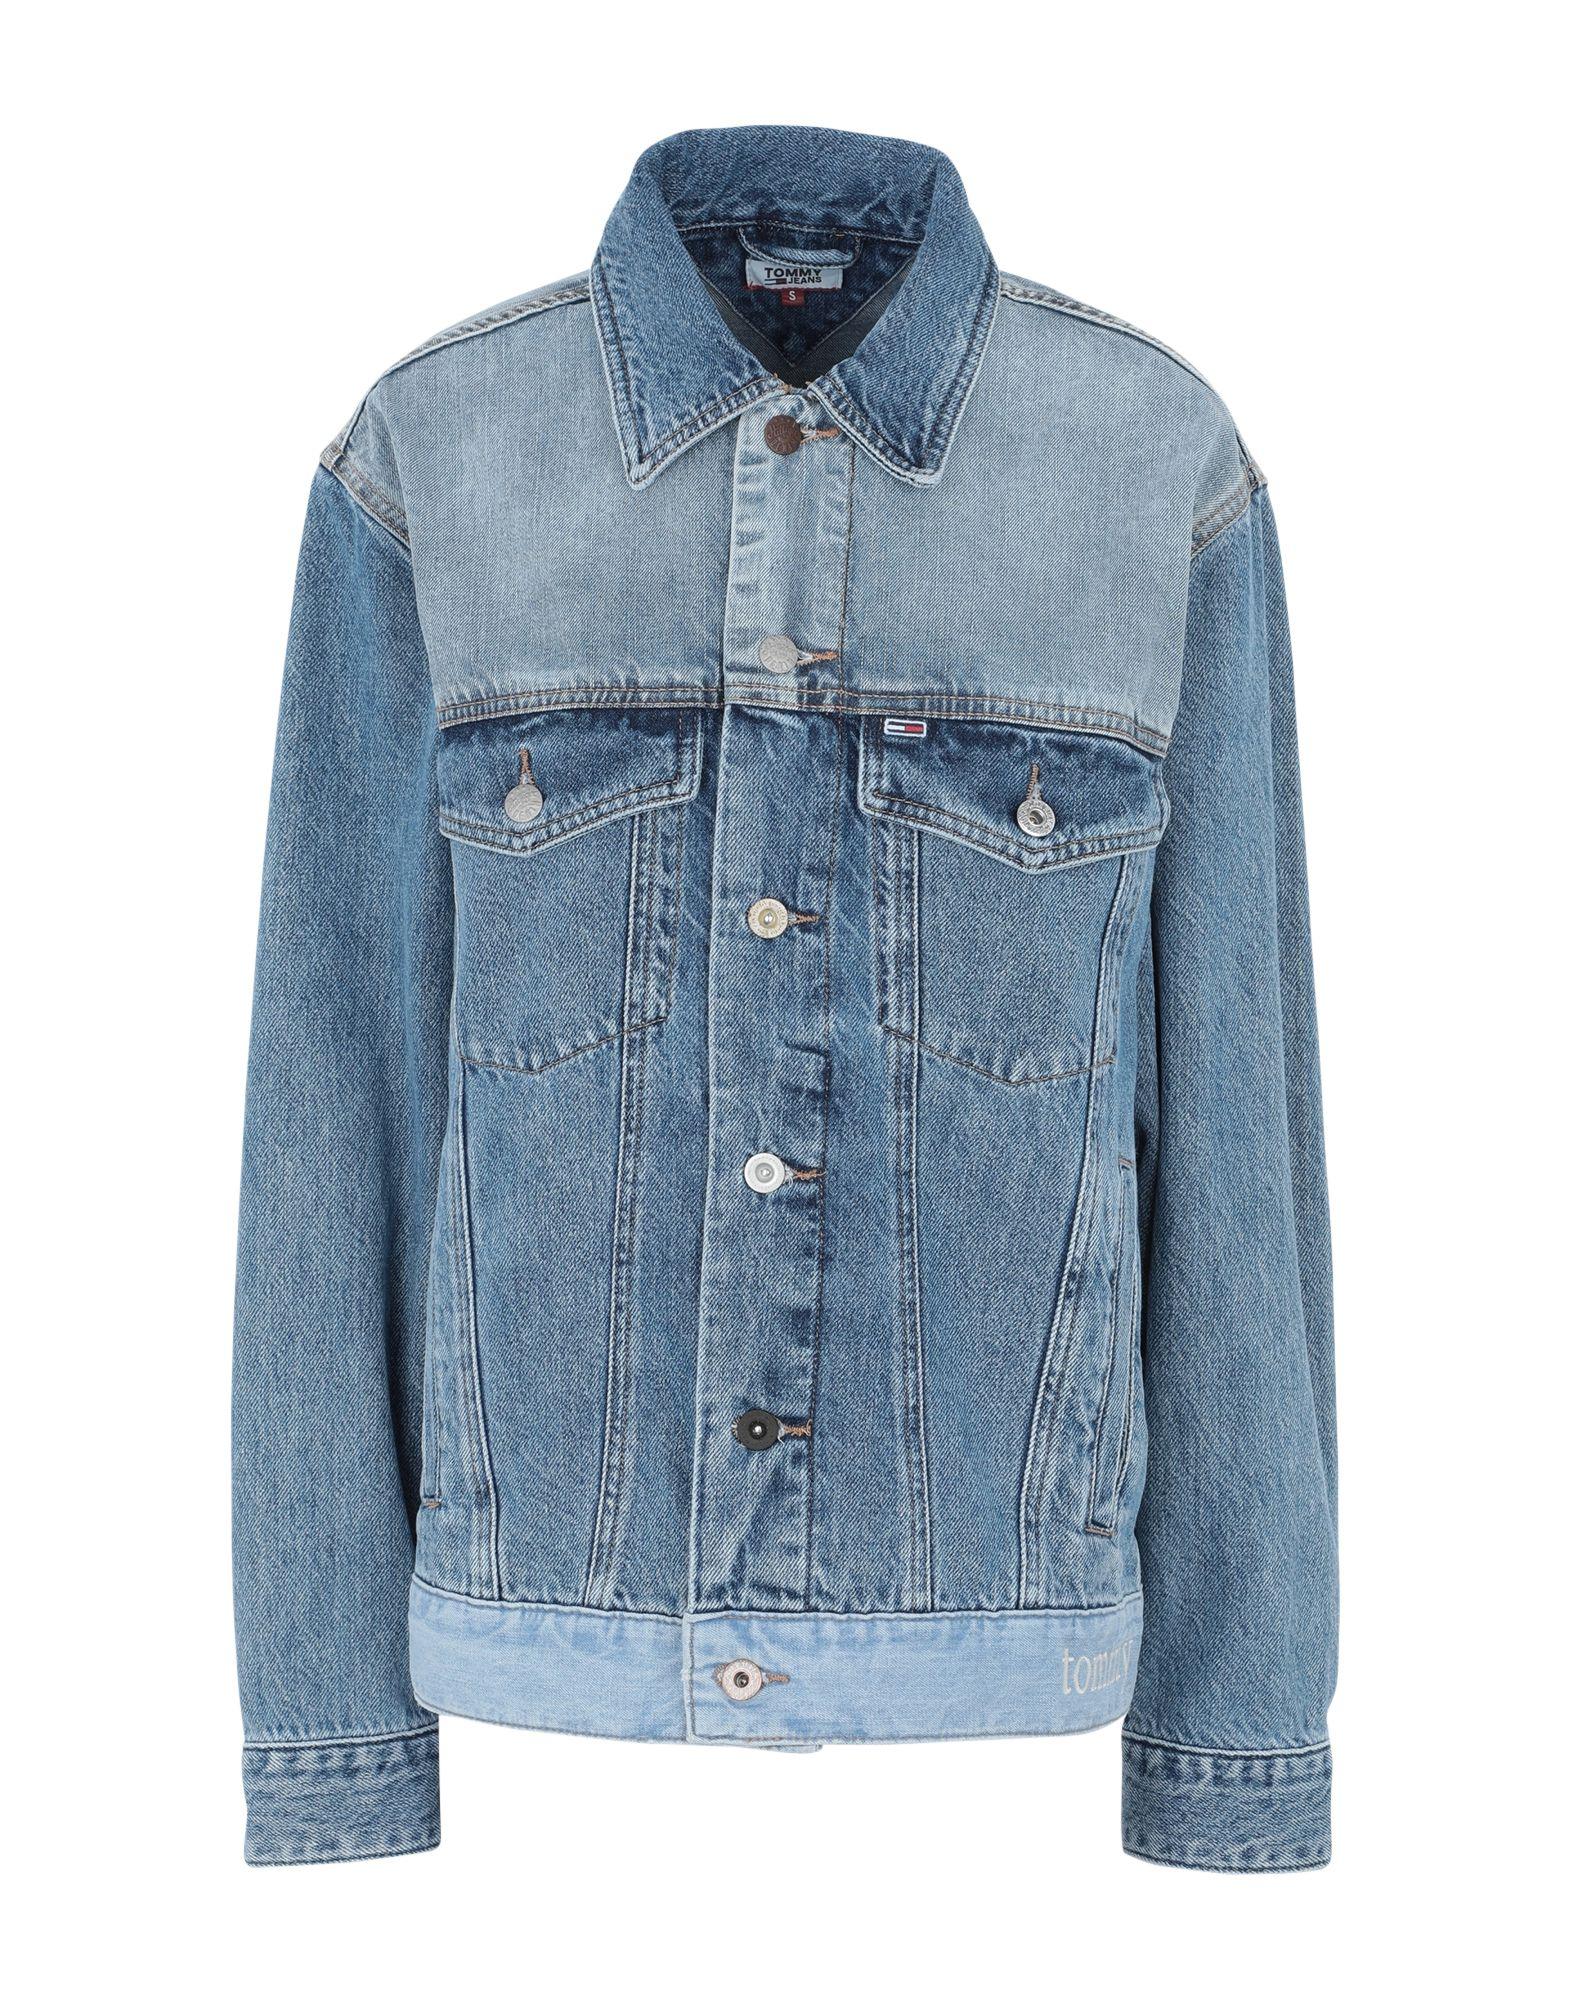 TOMMY JEANS Джинсовая верхняя одежда garcia jeans джинсовая верхняя одежда